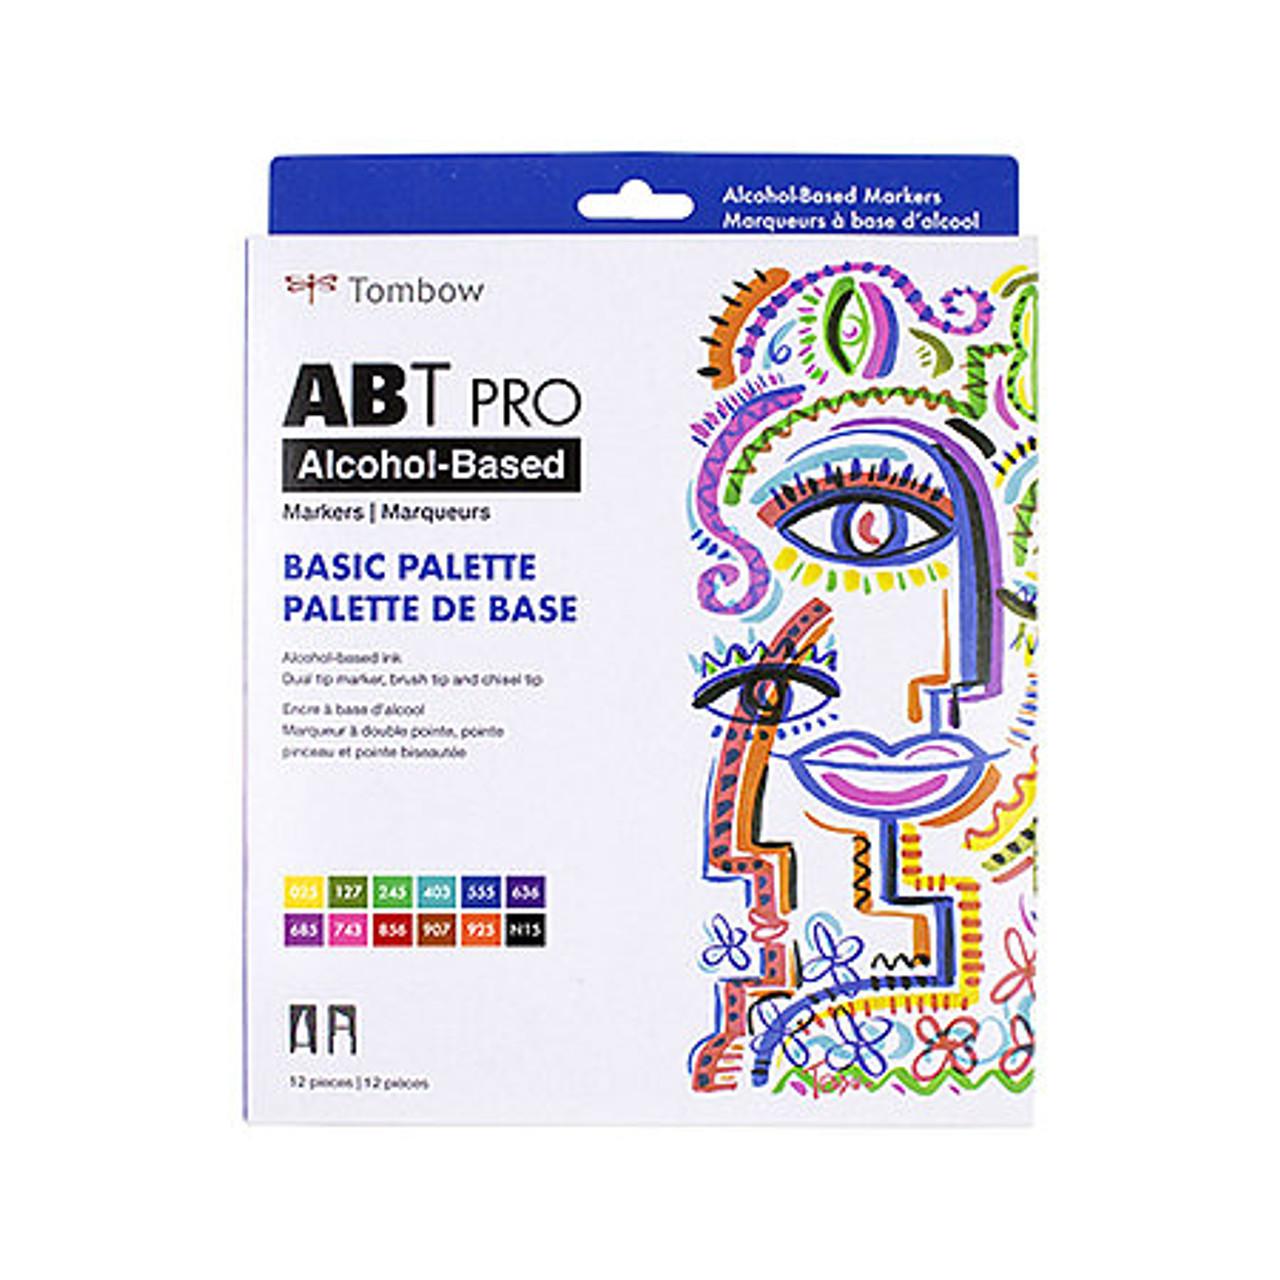 ABT PRO Brush 12-marker Set